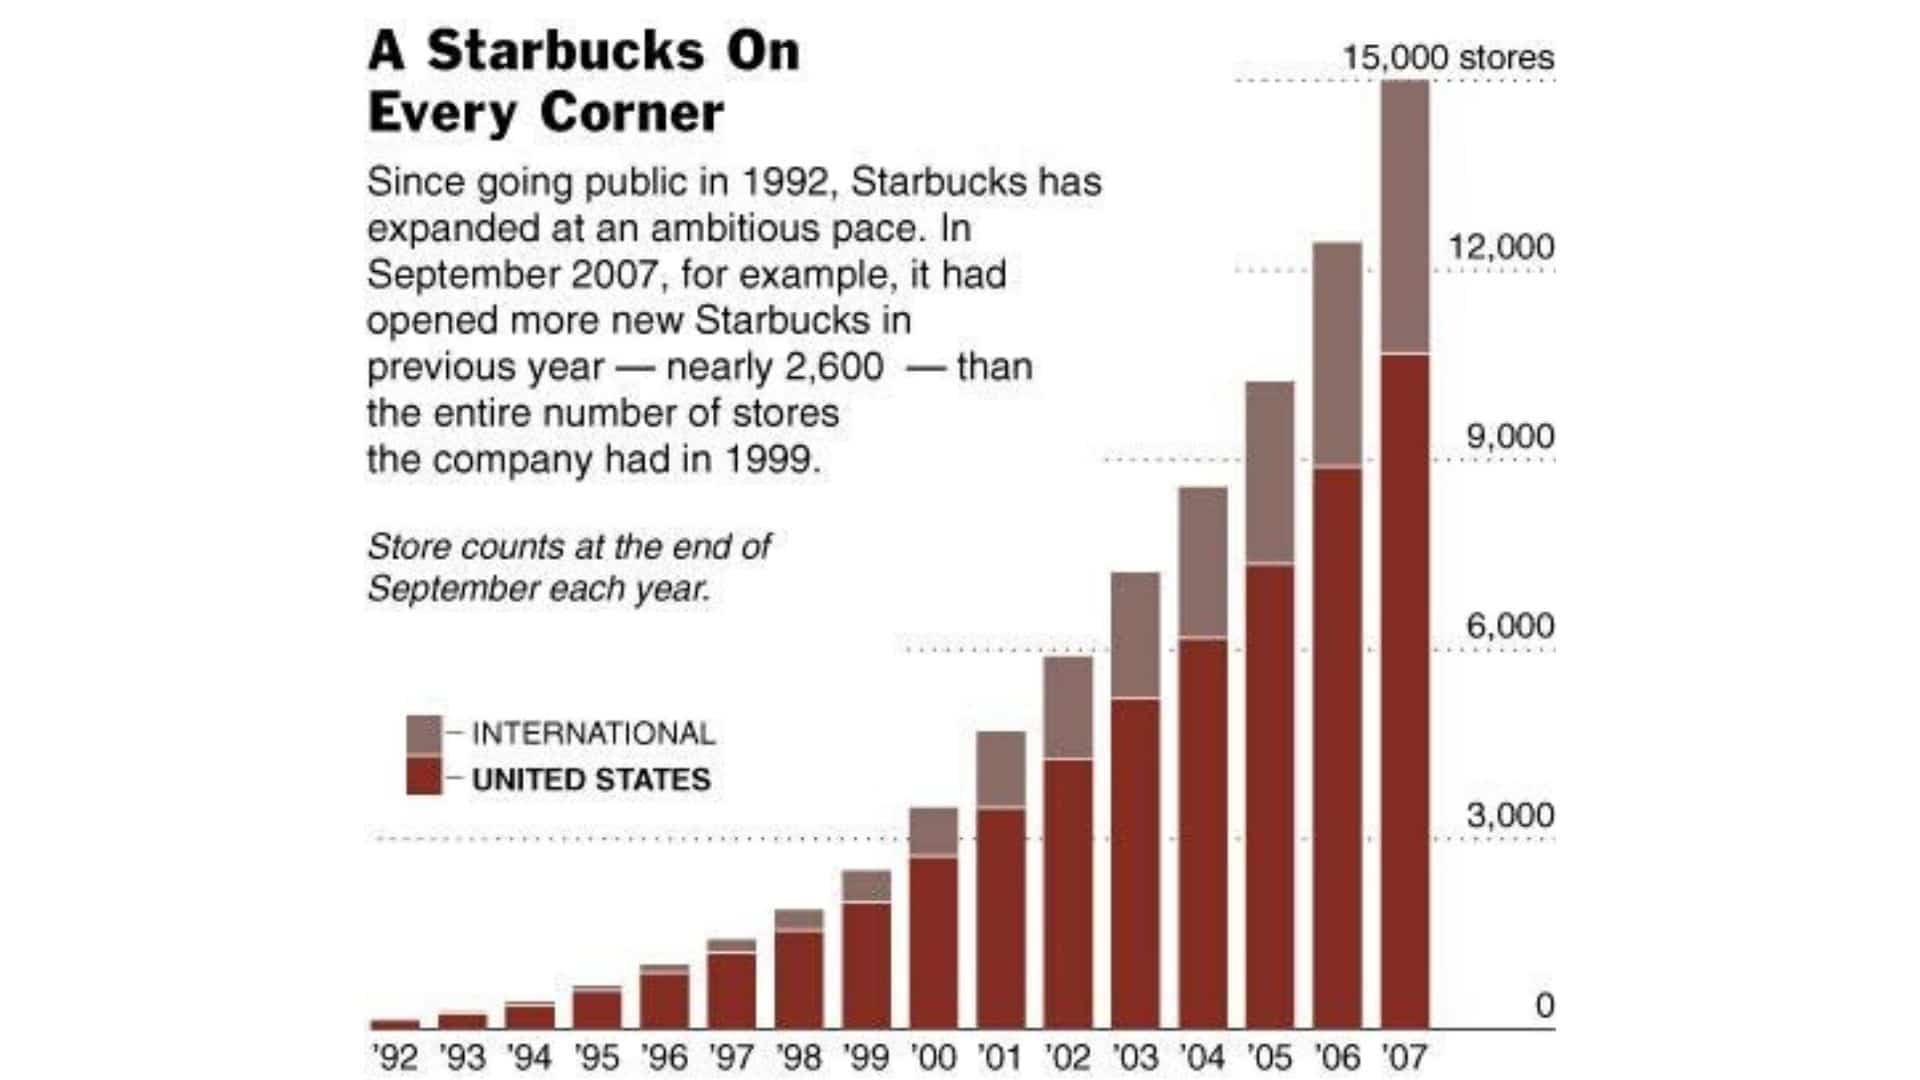 Starbucks Expansion Worldwide